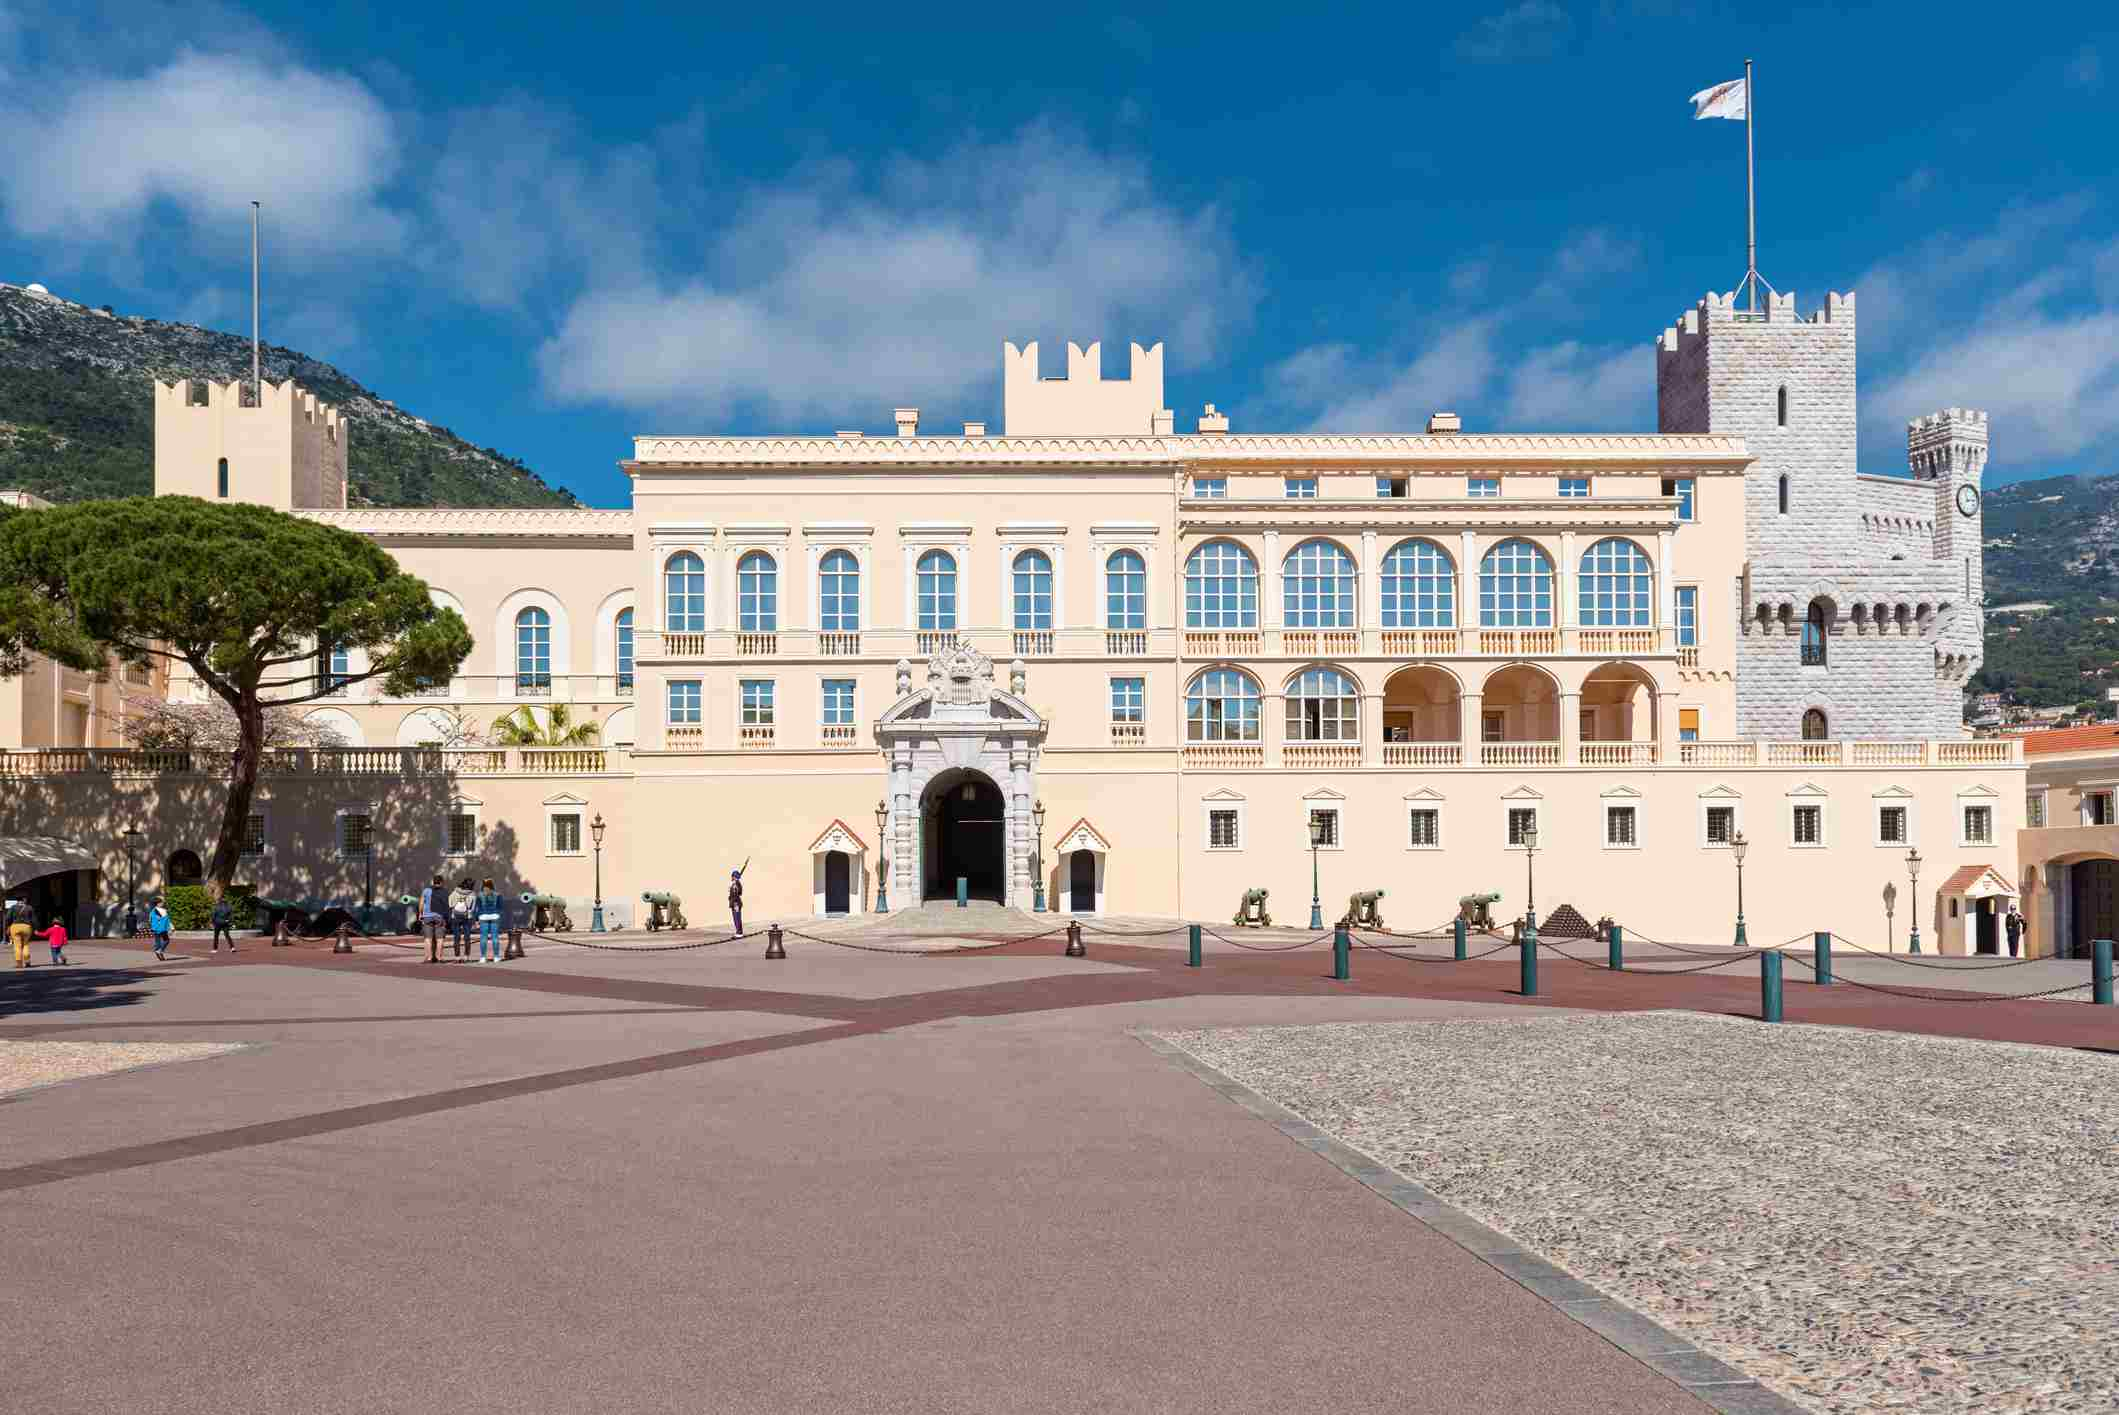 Prince's Palace of Monaco, Monte Carlo